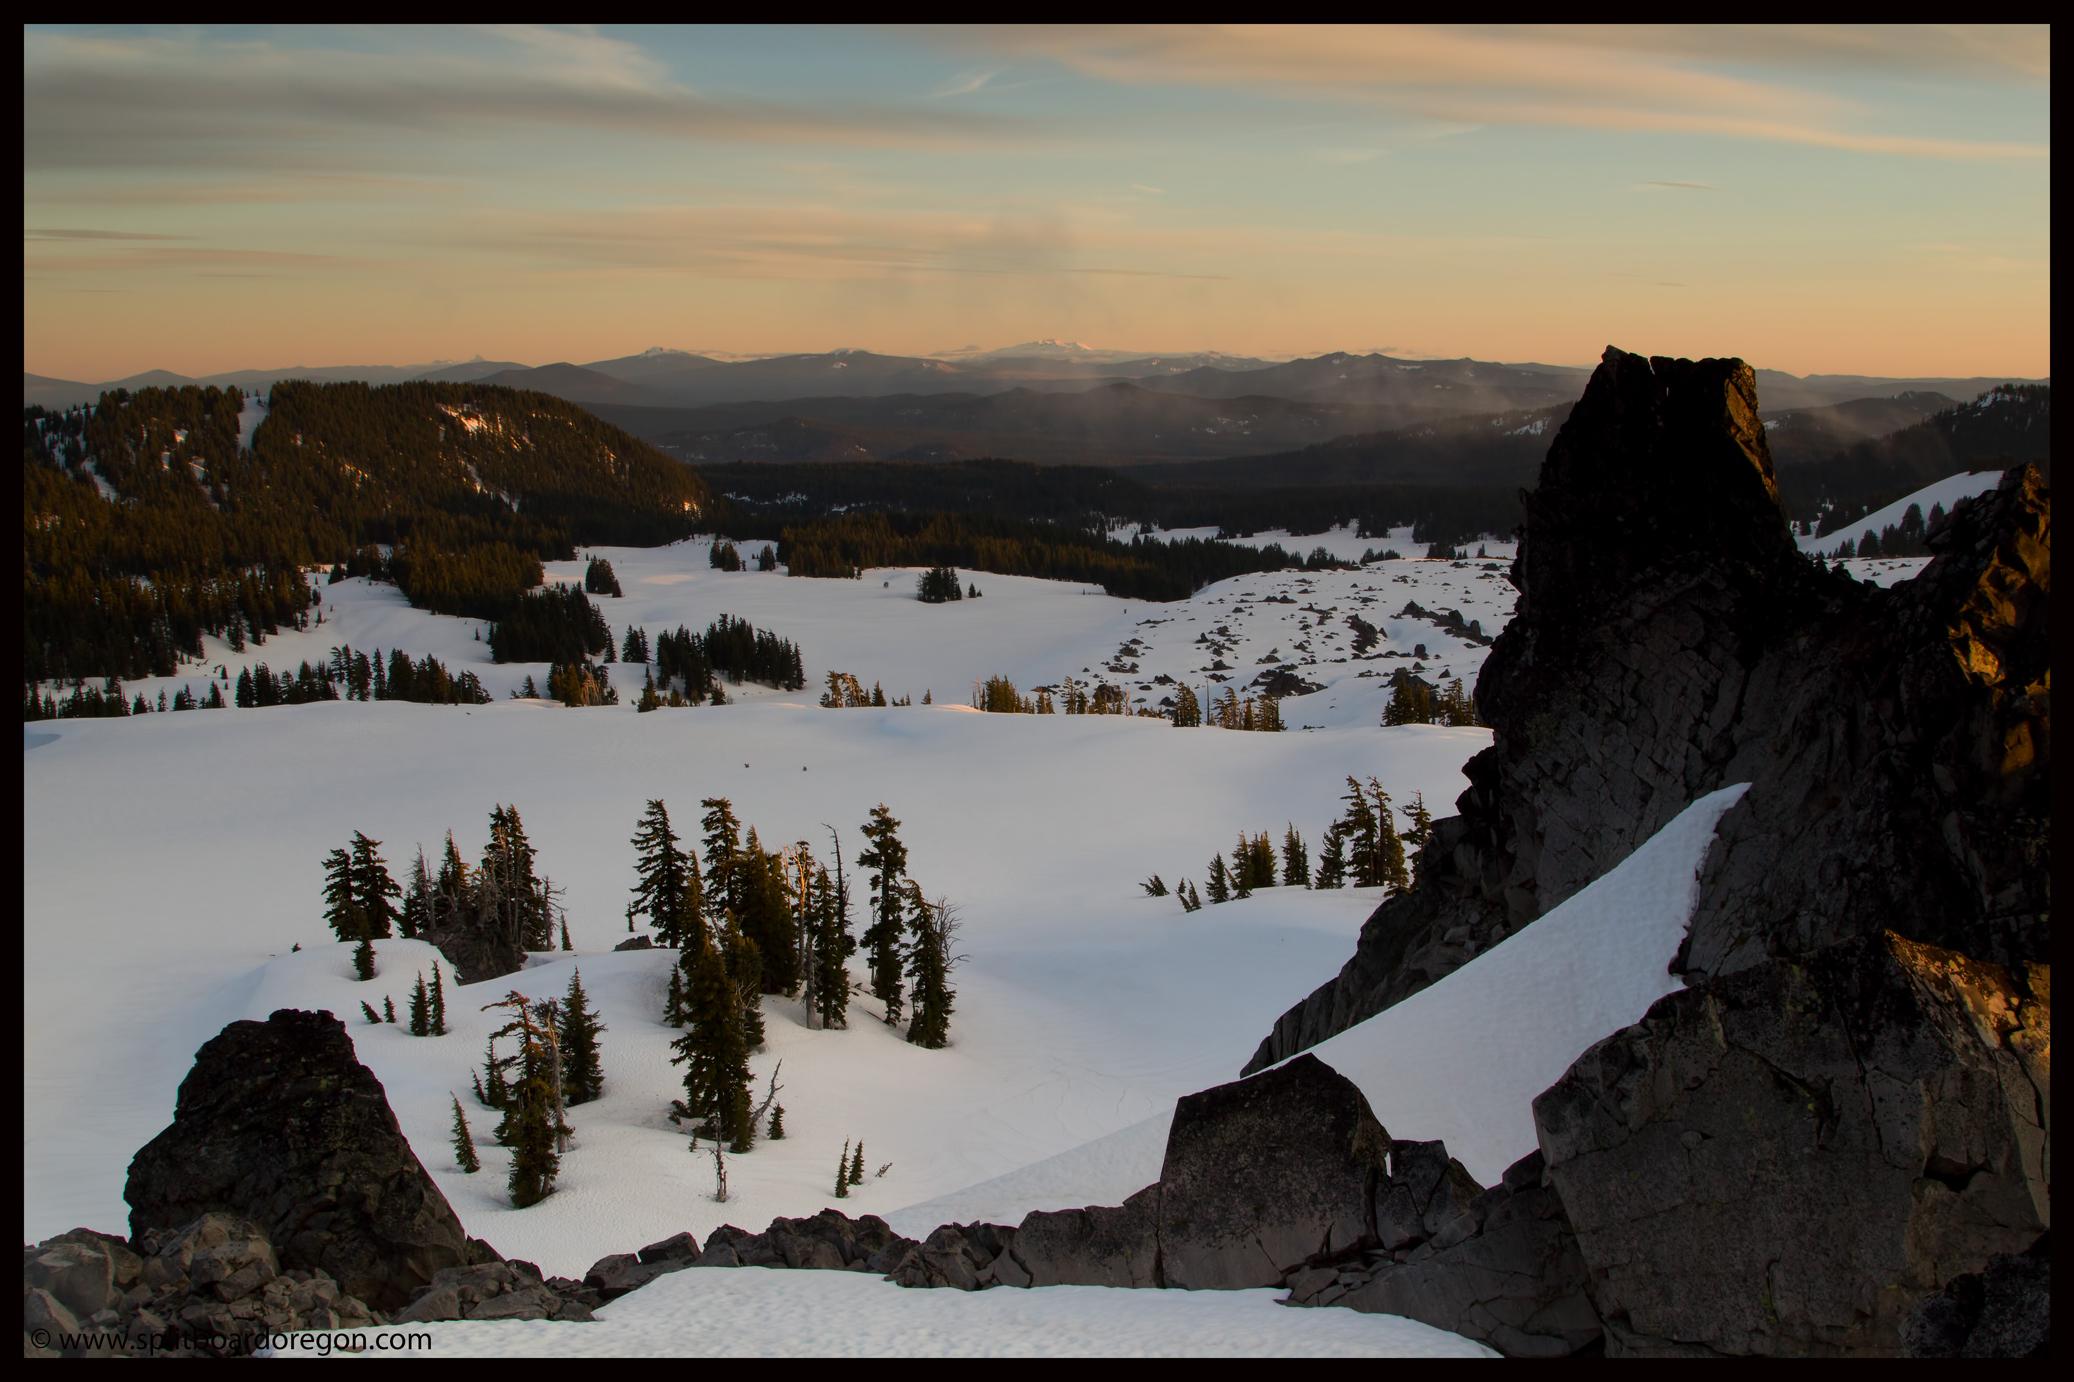 Looking south towards Diamond Peak